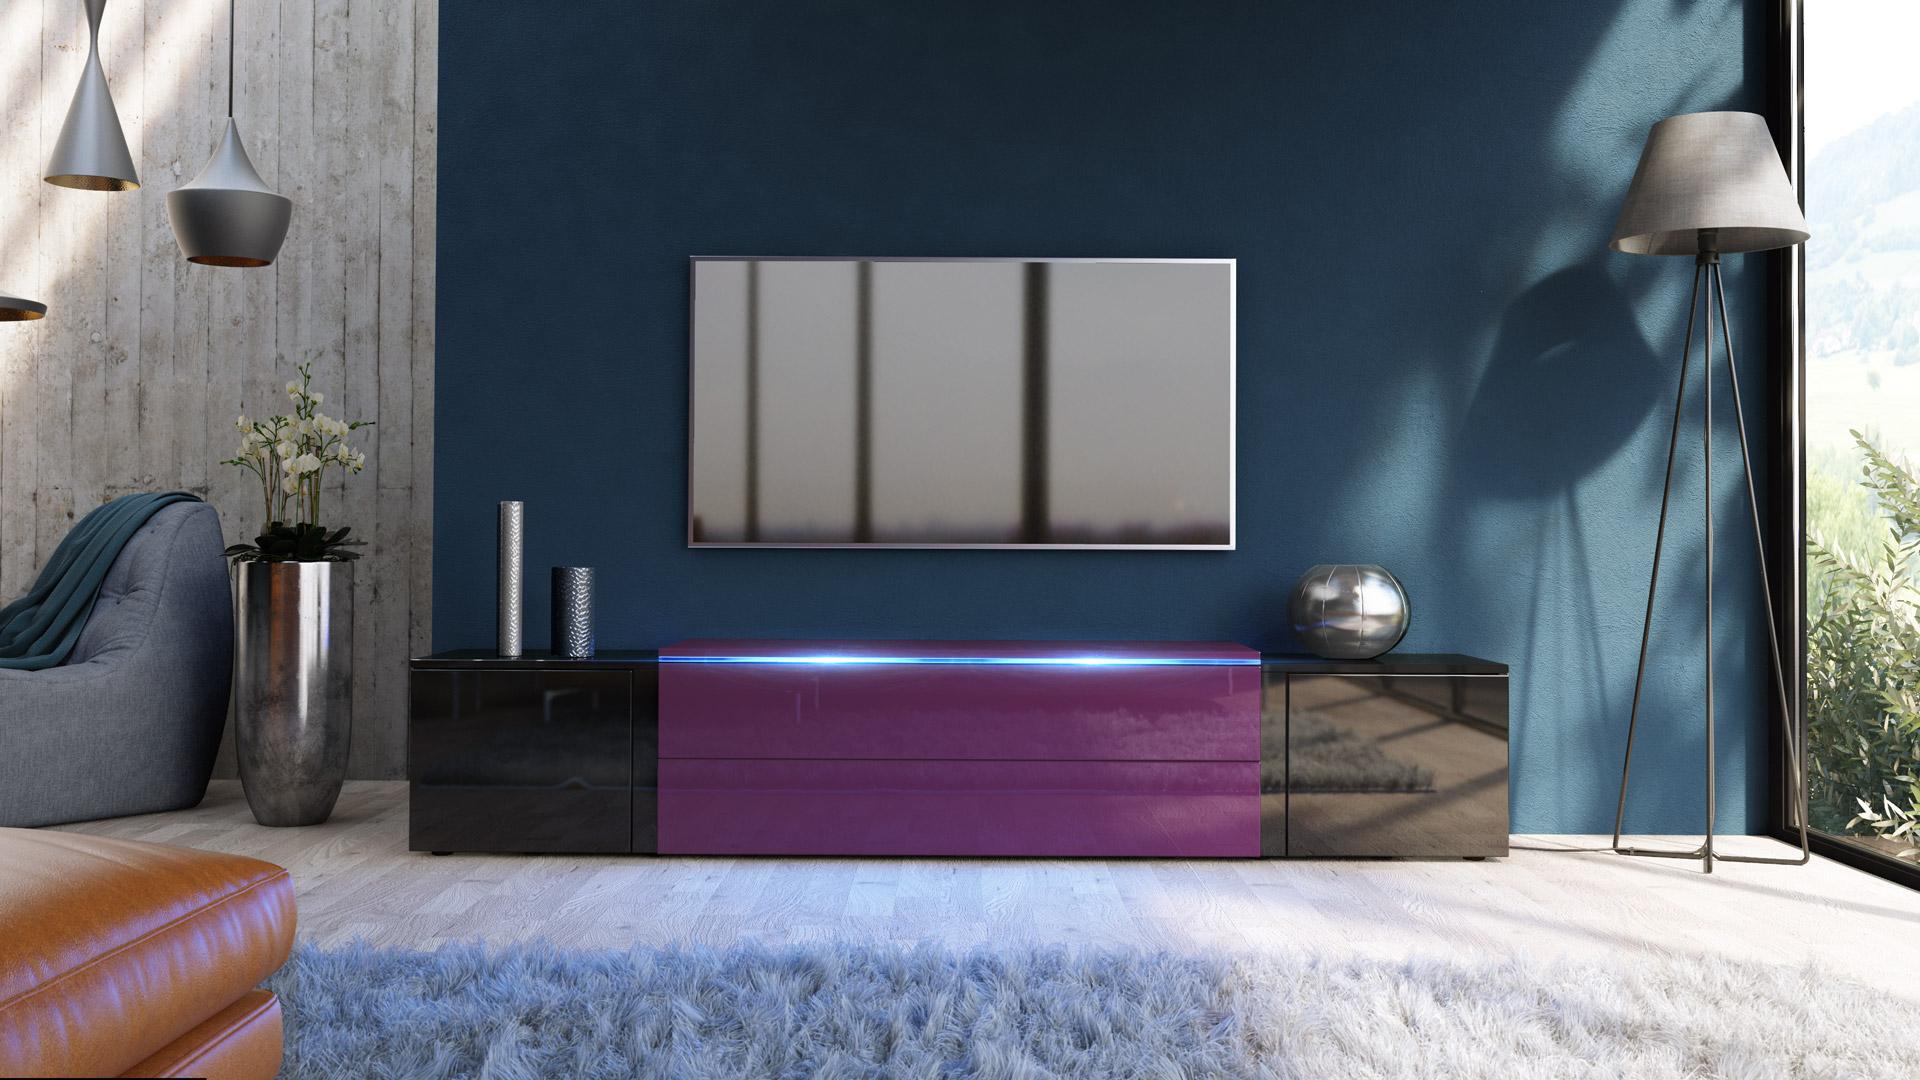 Tv Schrank Poco. Elegant Tvlowboard Ca X X Cm With Tv Schrank Poco ...